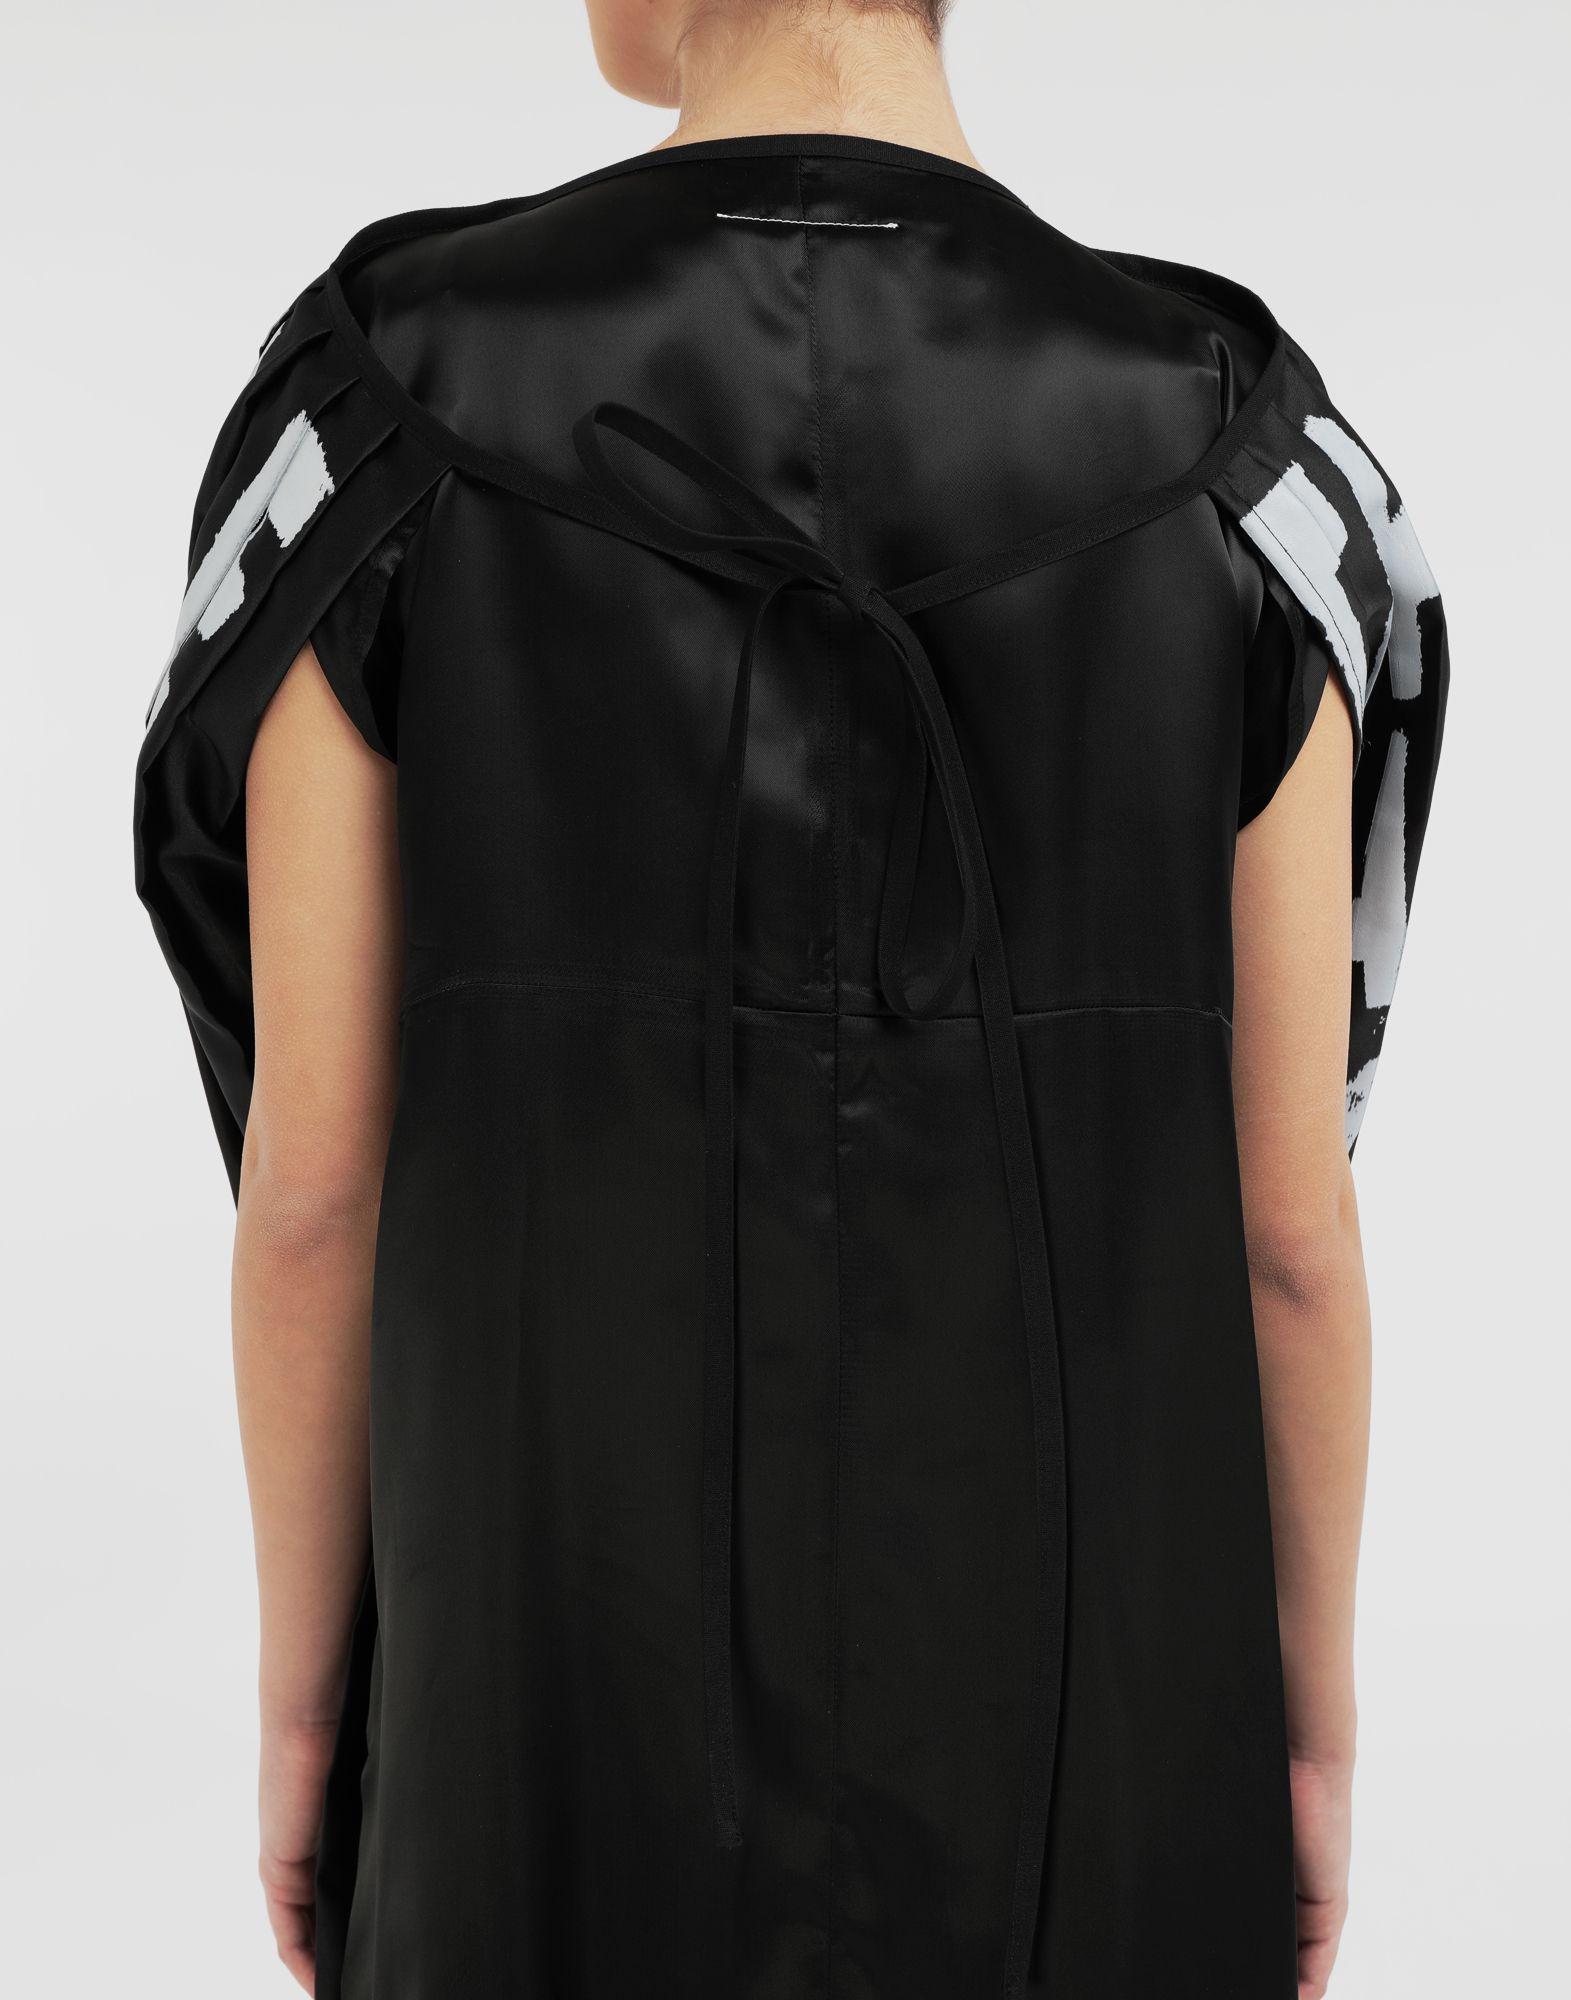 MM6 MAISON MARGIELA AIDS Charity pleated dress Short dress Woman b